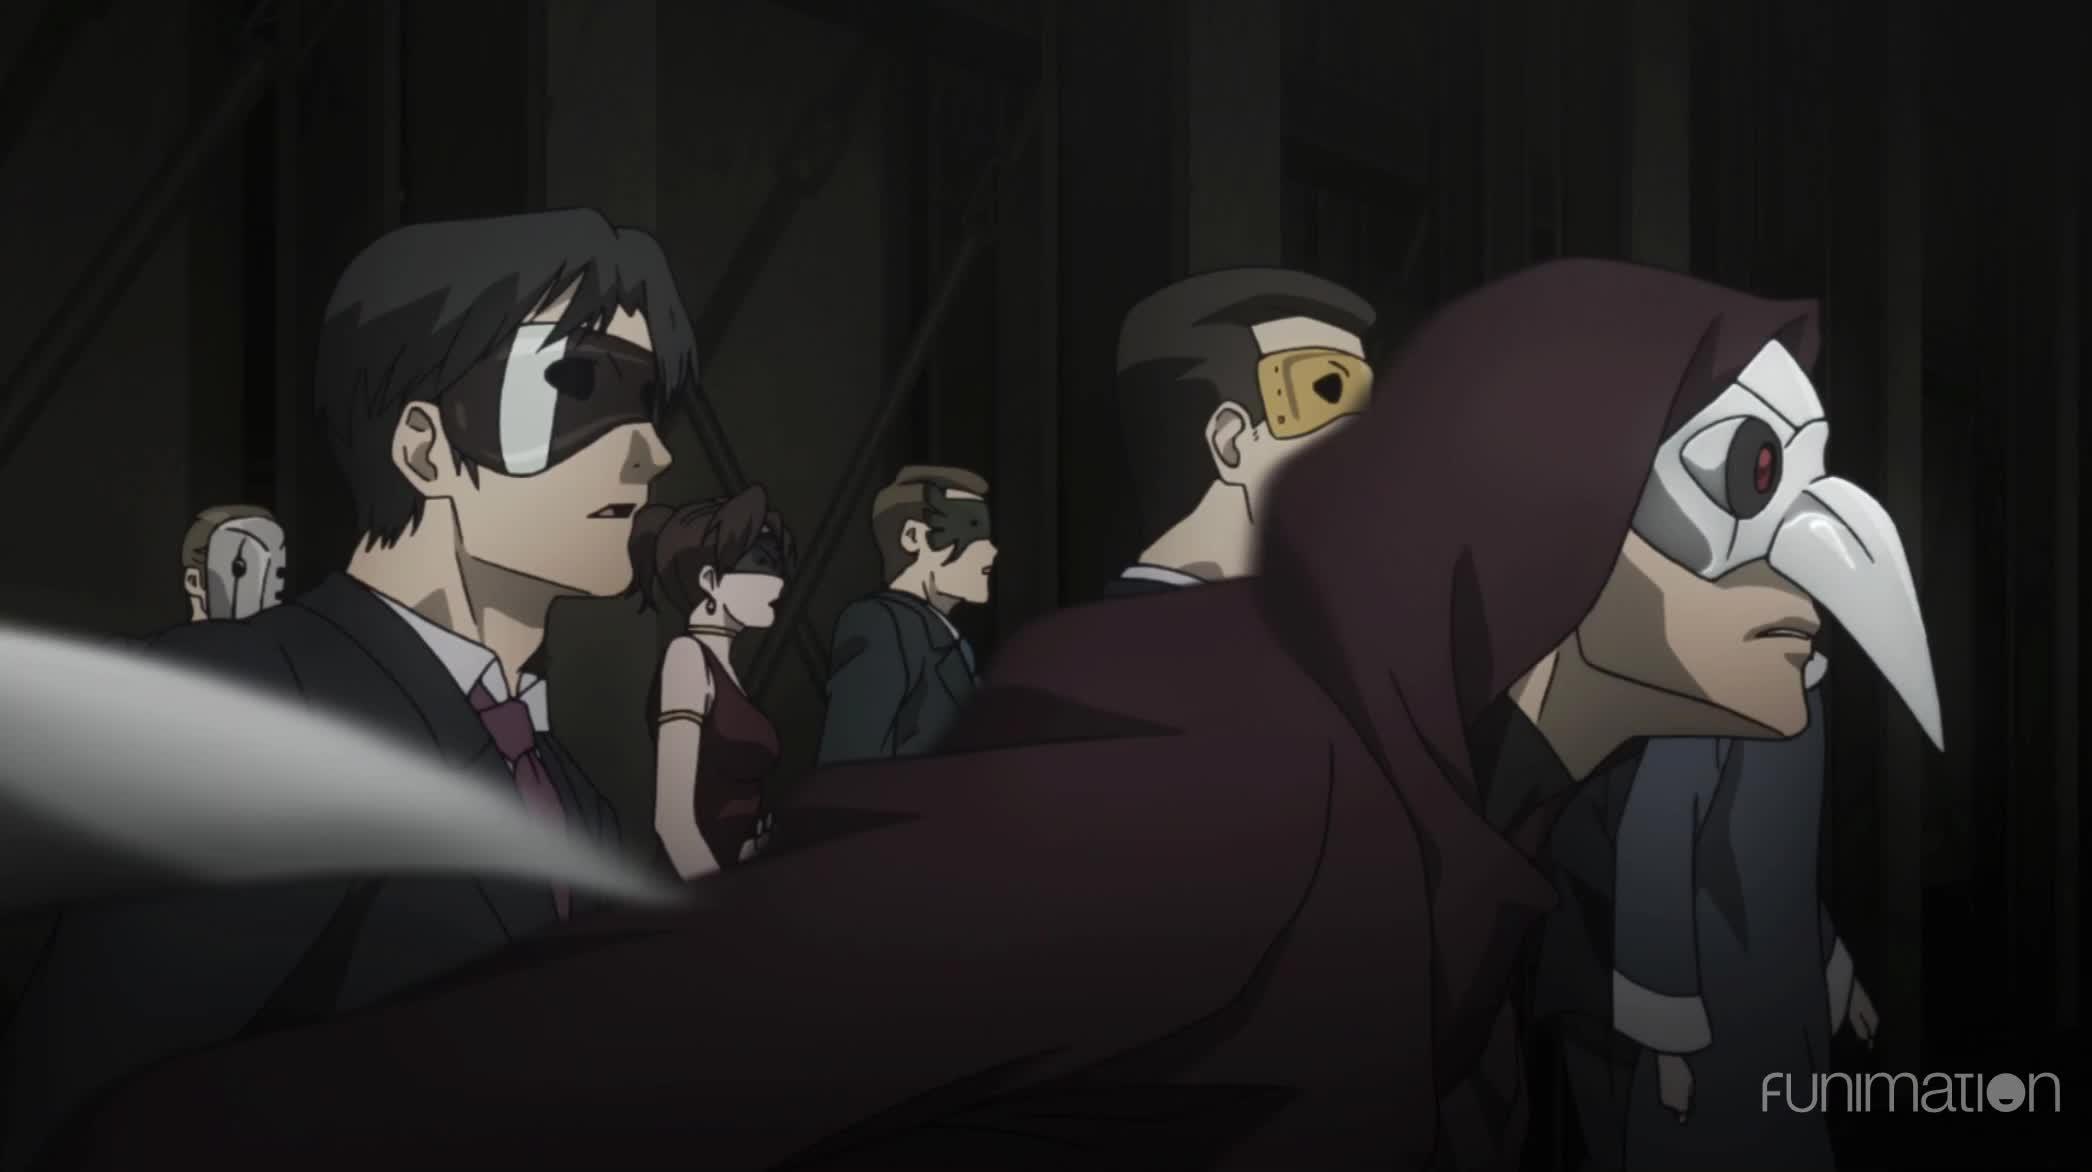 Funimation, action, anime, ghoul, season 3, tokyo ghoul, tokyo ghoul:re, tokyo ghoul:re episode 29, raining blood GIFs